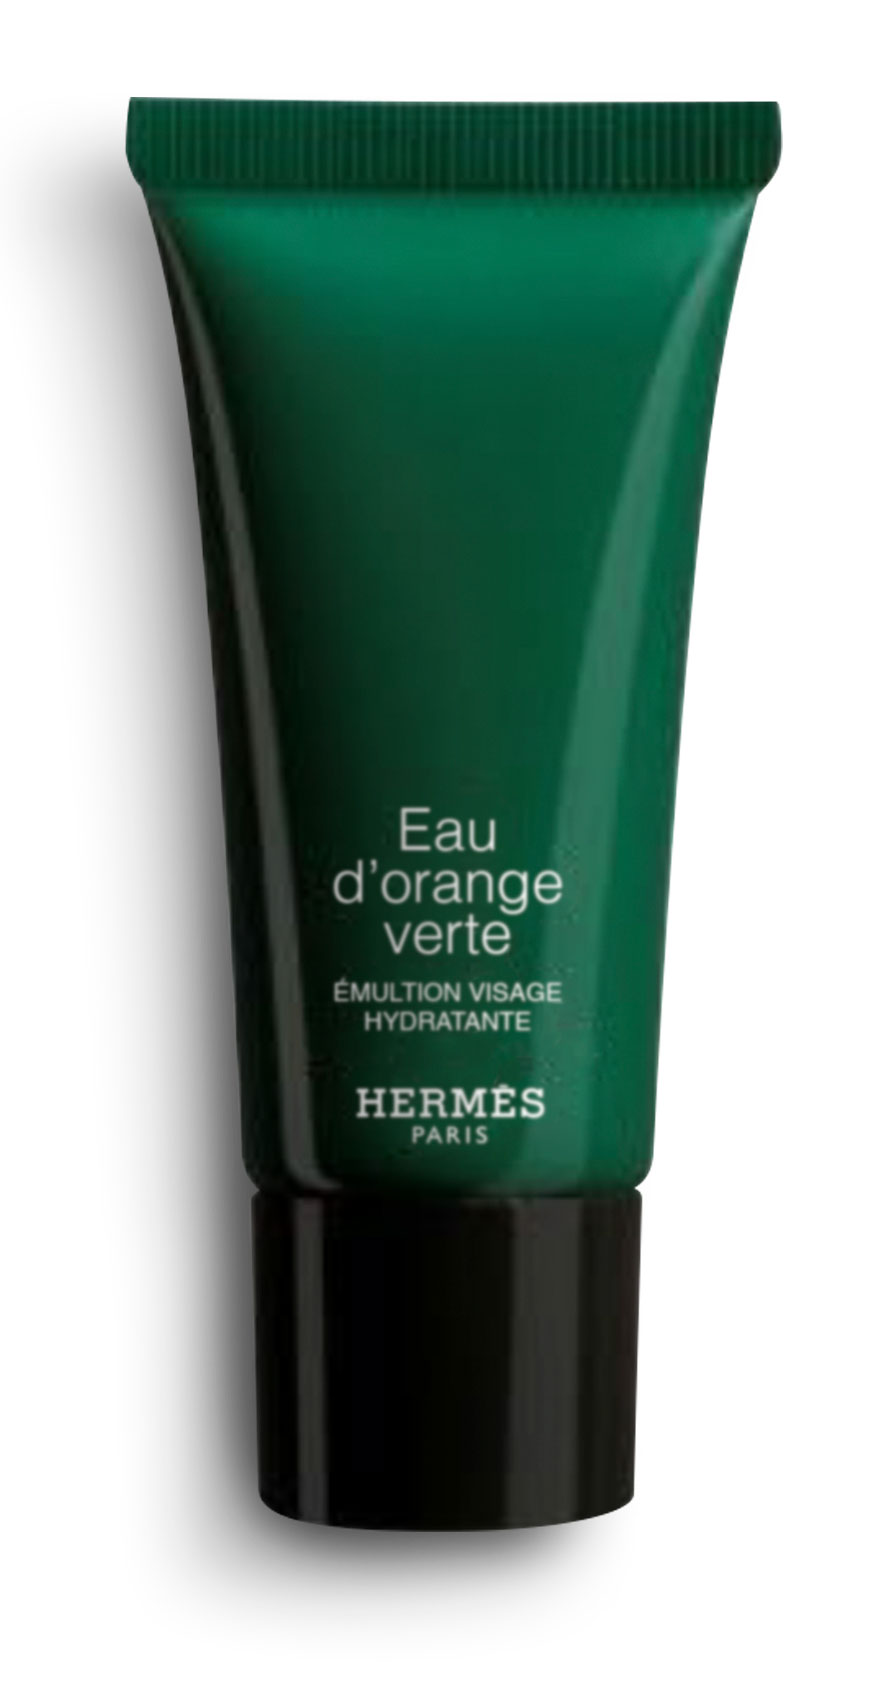 Hermès - Eau d'orange verte - Baume visage 15 ml